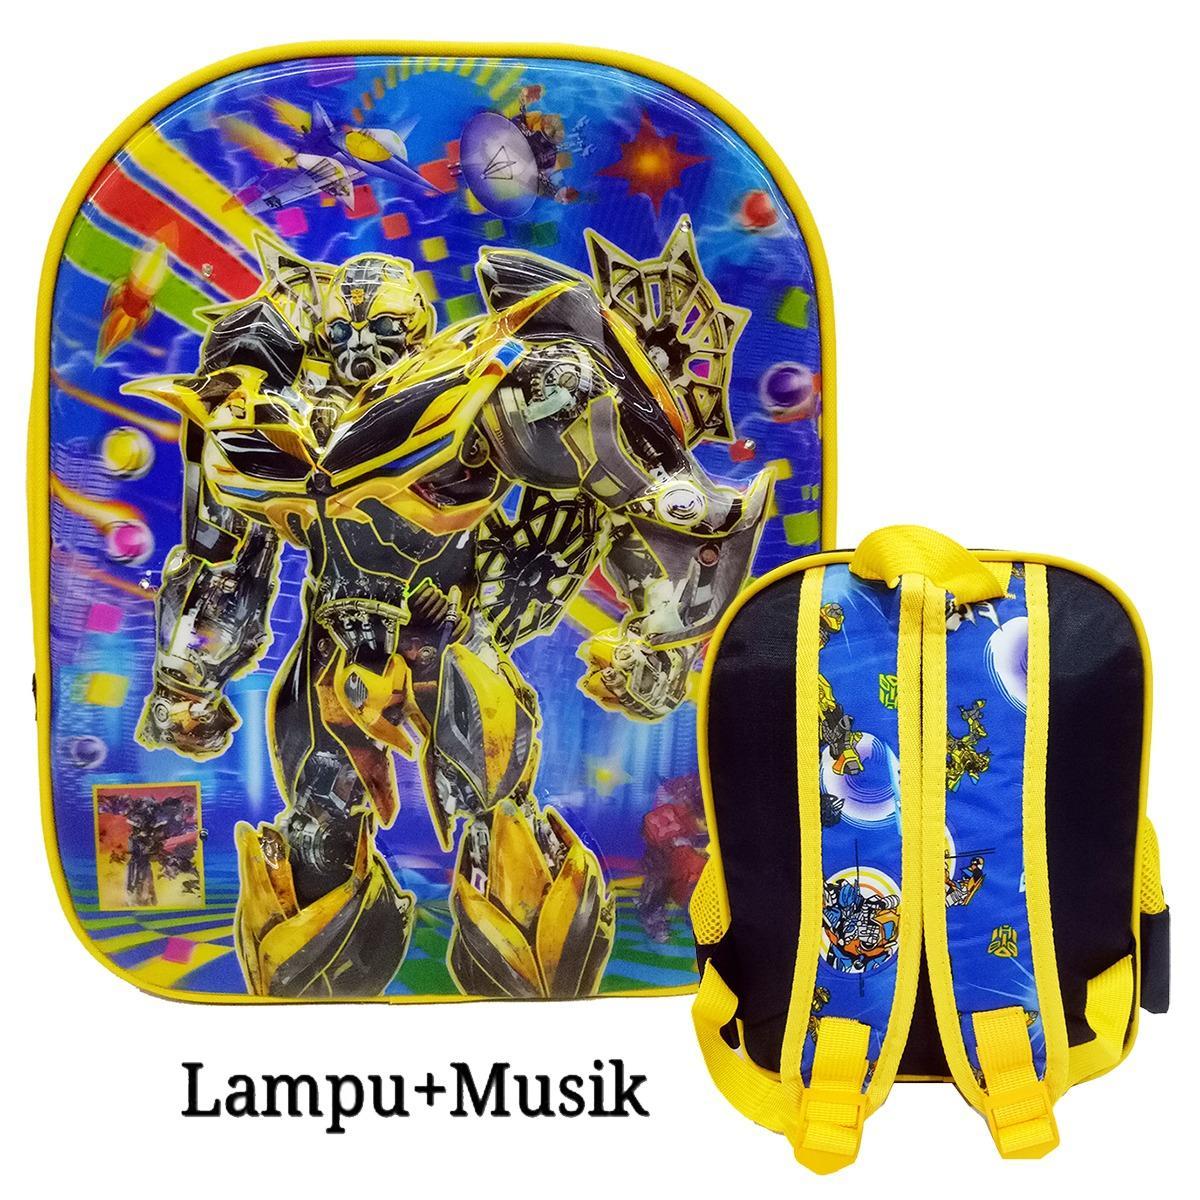 Harga Onlan Transformers 5D Lampu Timbul Hologram Anti Gorestas Ransel Anak Sekolah Tk Play Group Import Blue Paling Murah